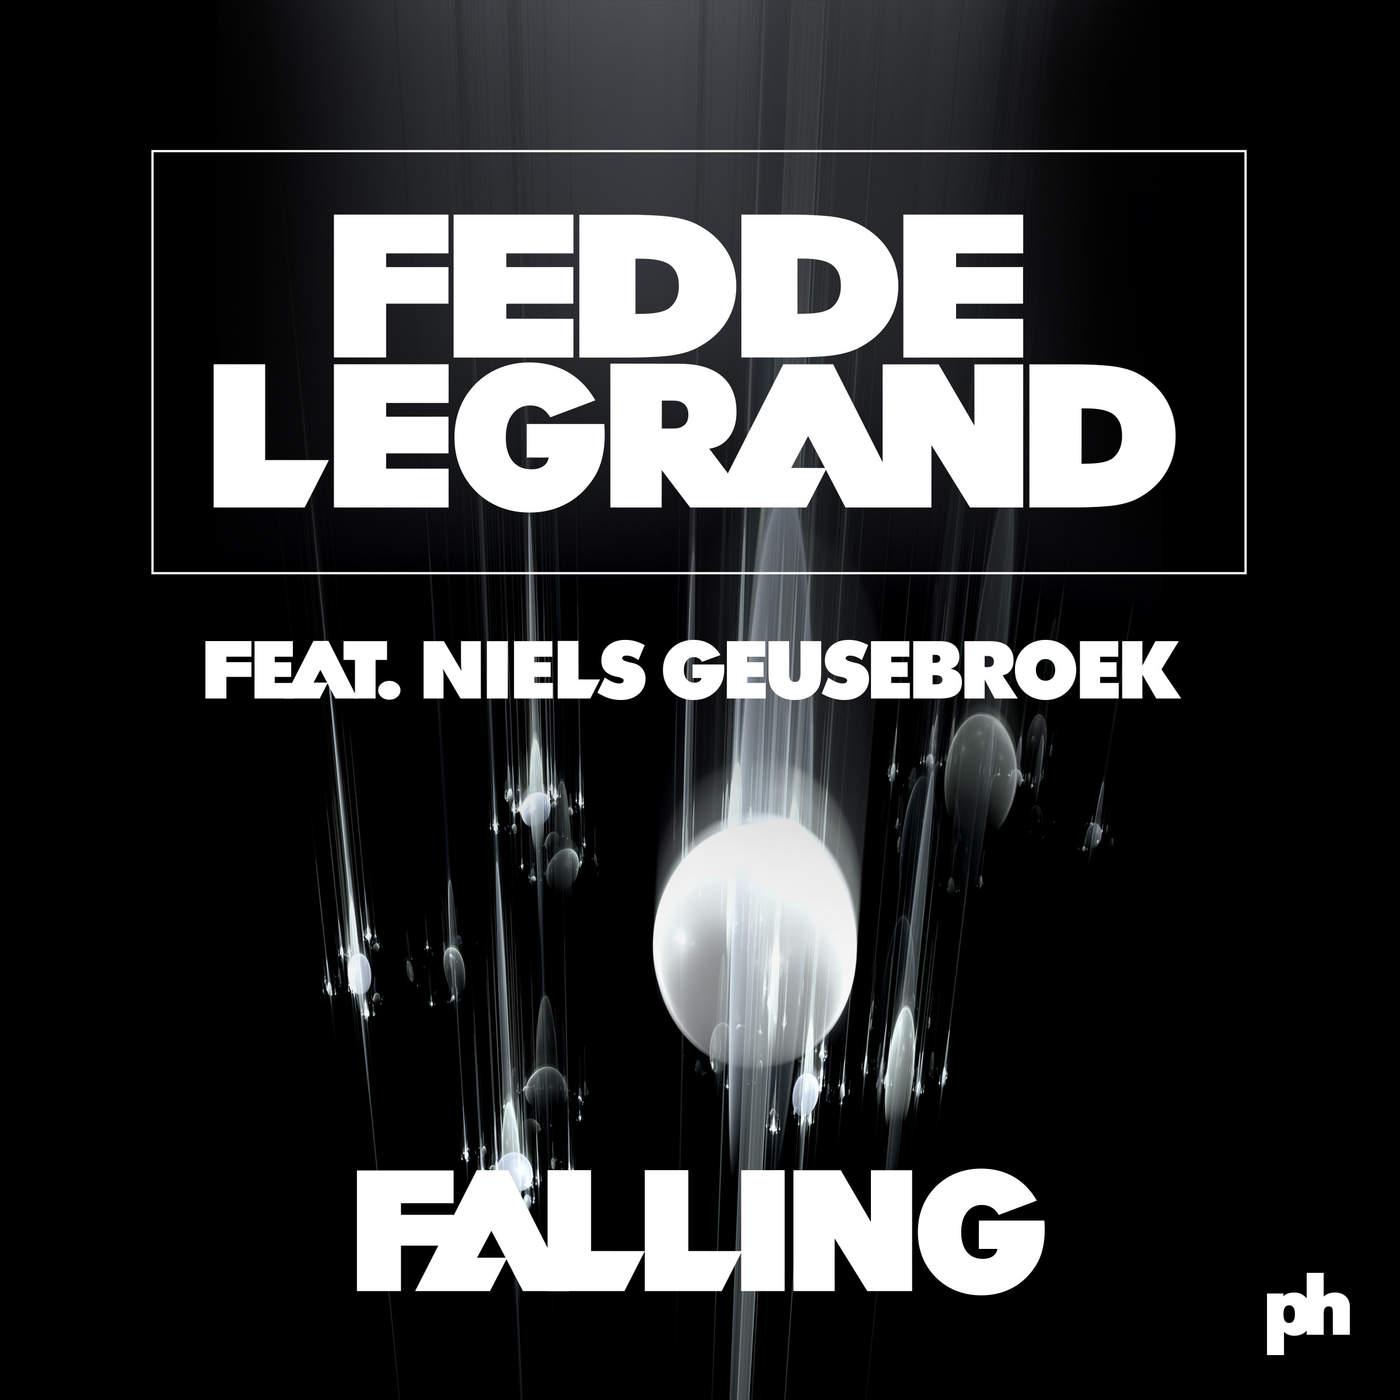 Fedde le Grand - Falling (feat. Niels Geusebroek) [Radio Edit] - Single Cover